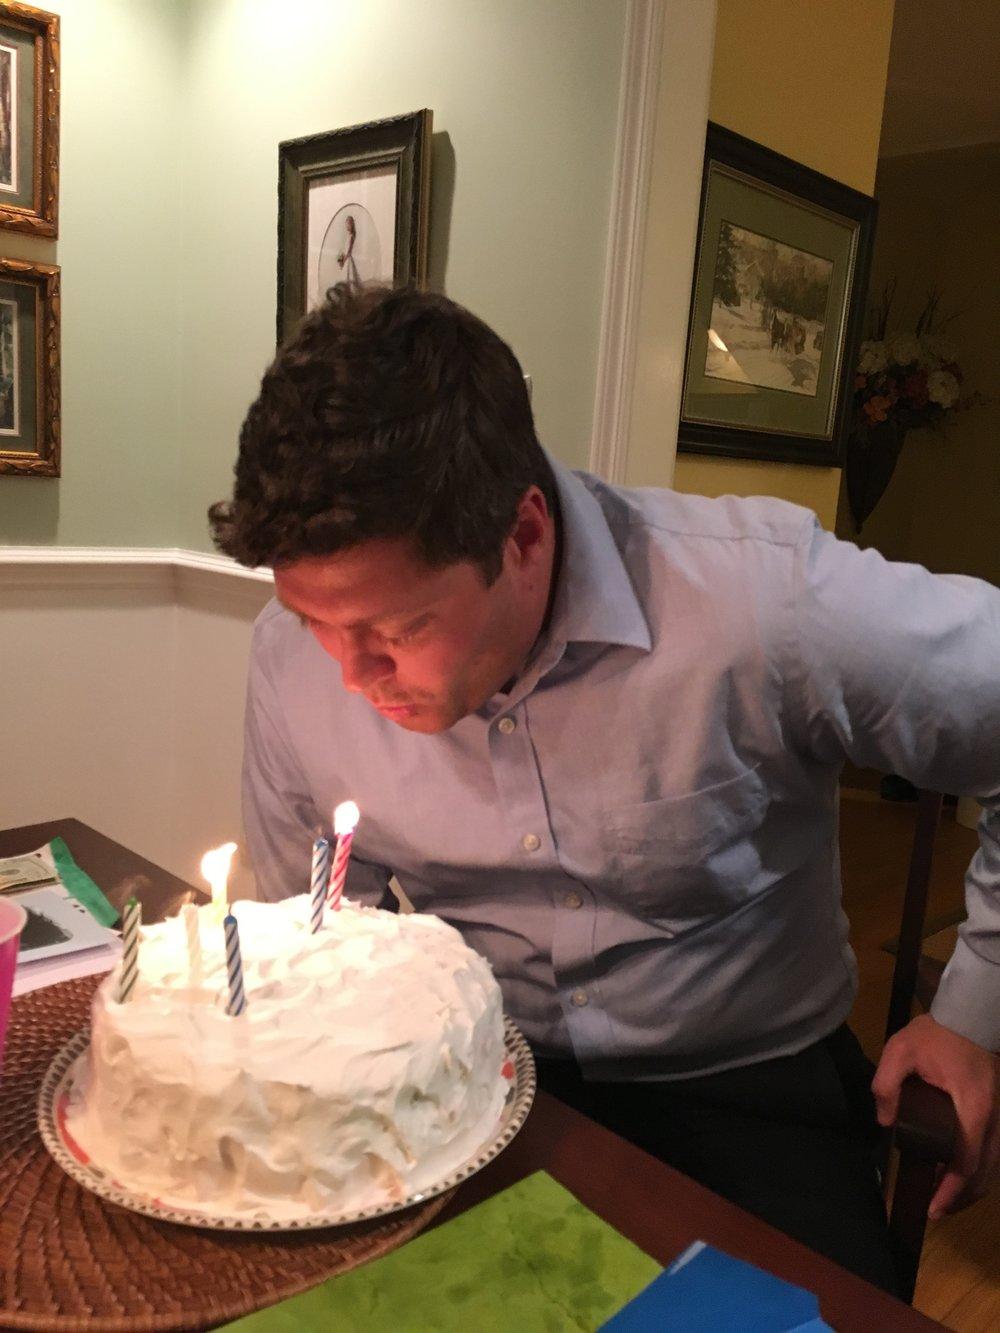 Chad's birthday